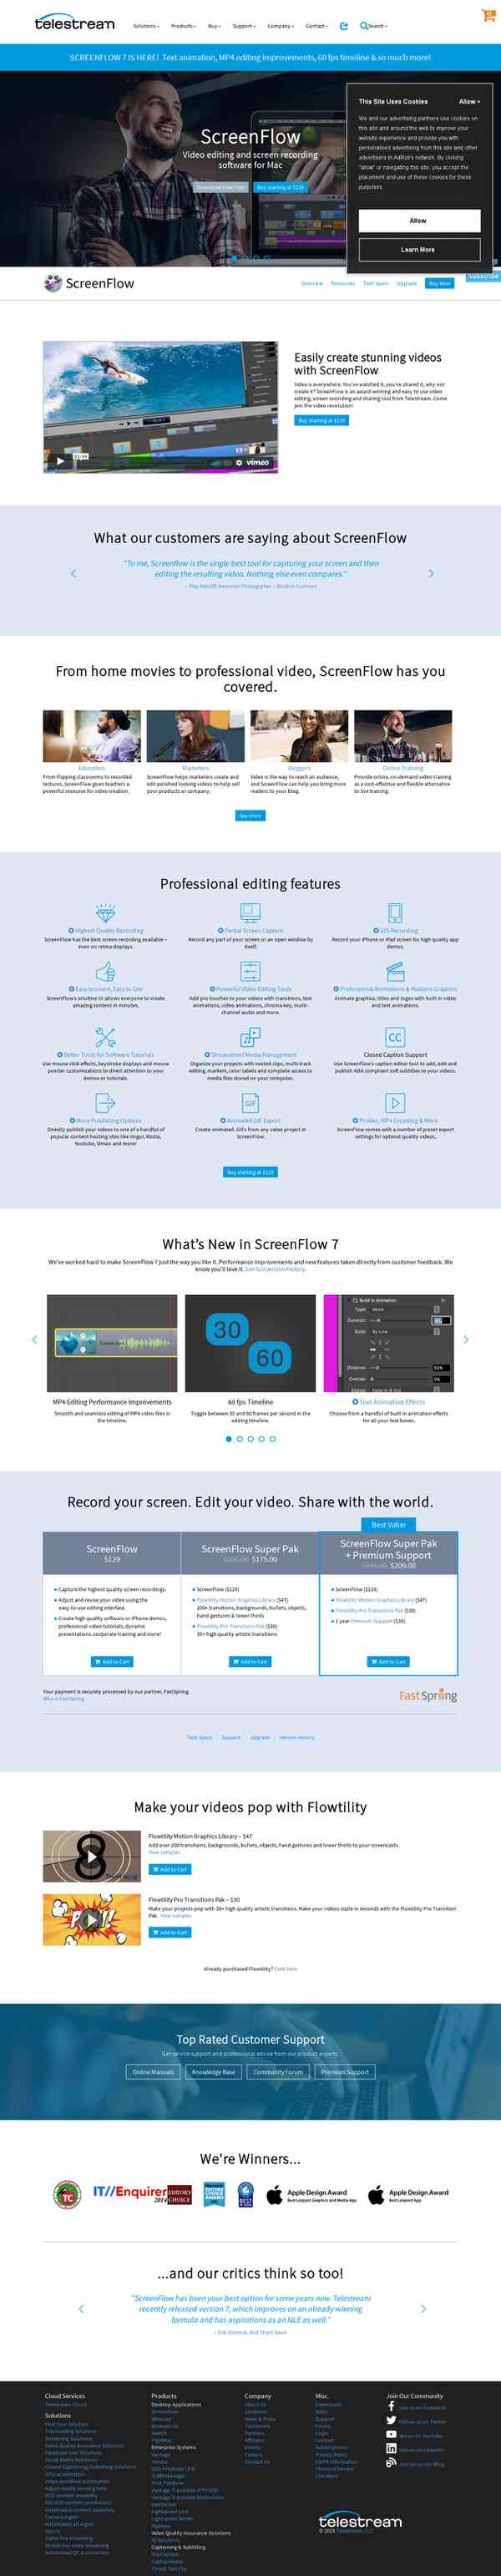 telestream.net/screenflow/overview.htm